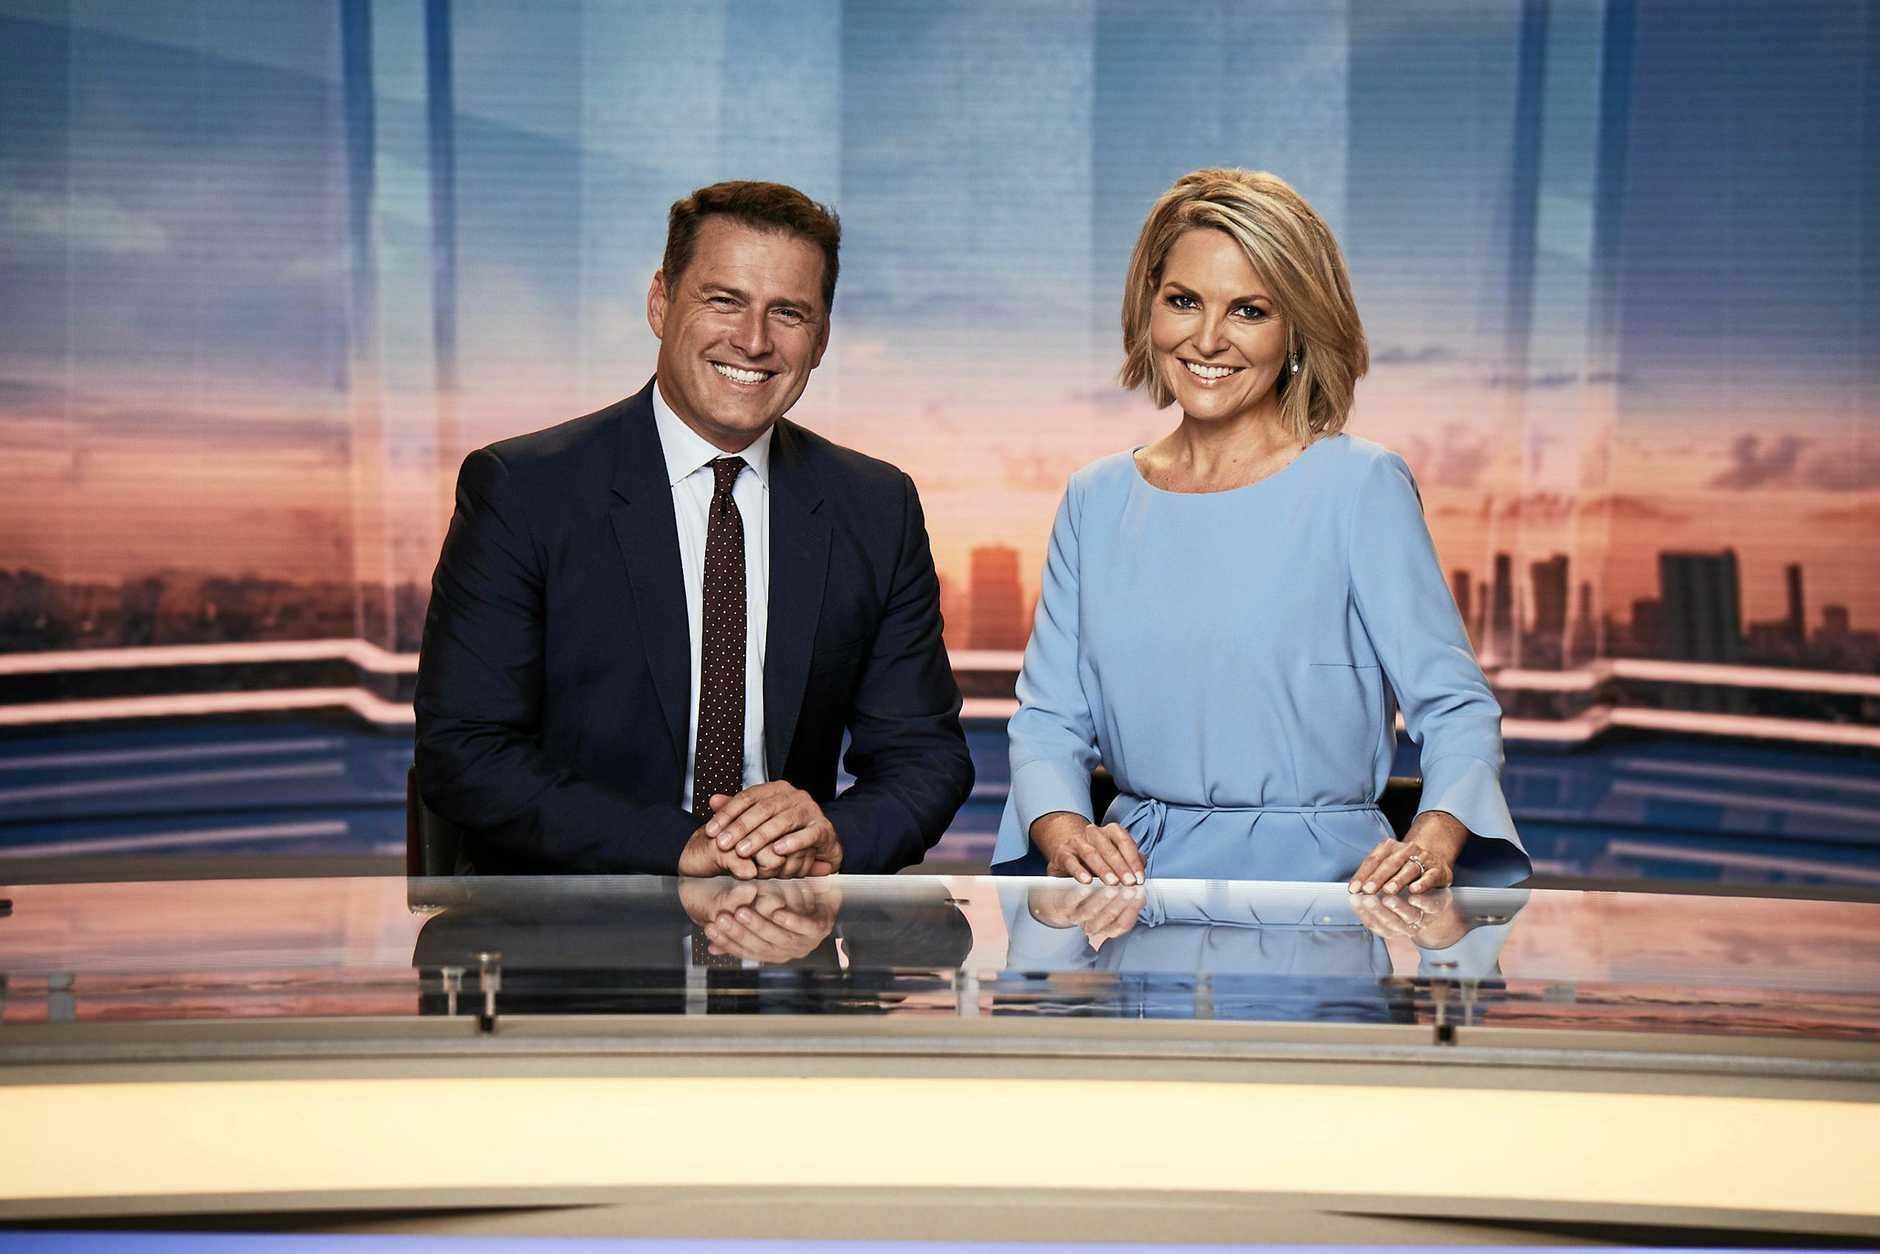 It is understood Georgie Gardner will broadcast from Channel 9's studio in Sydney.